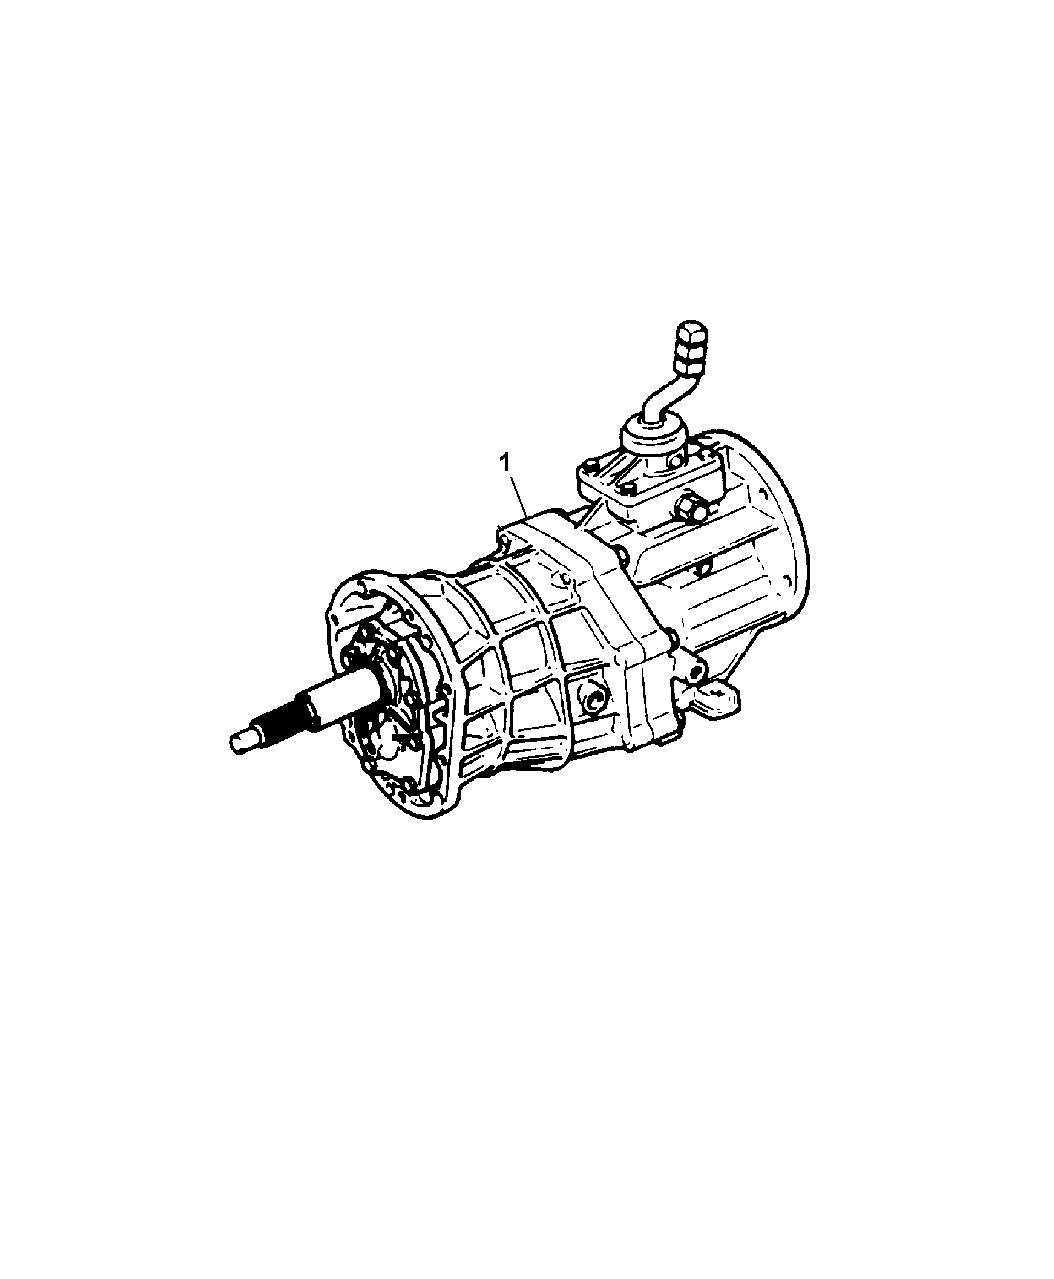 52108118AB - Genuine Mopar TRANS-5 SPEED